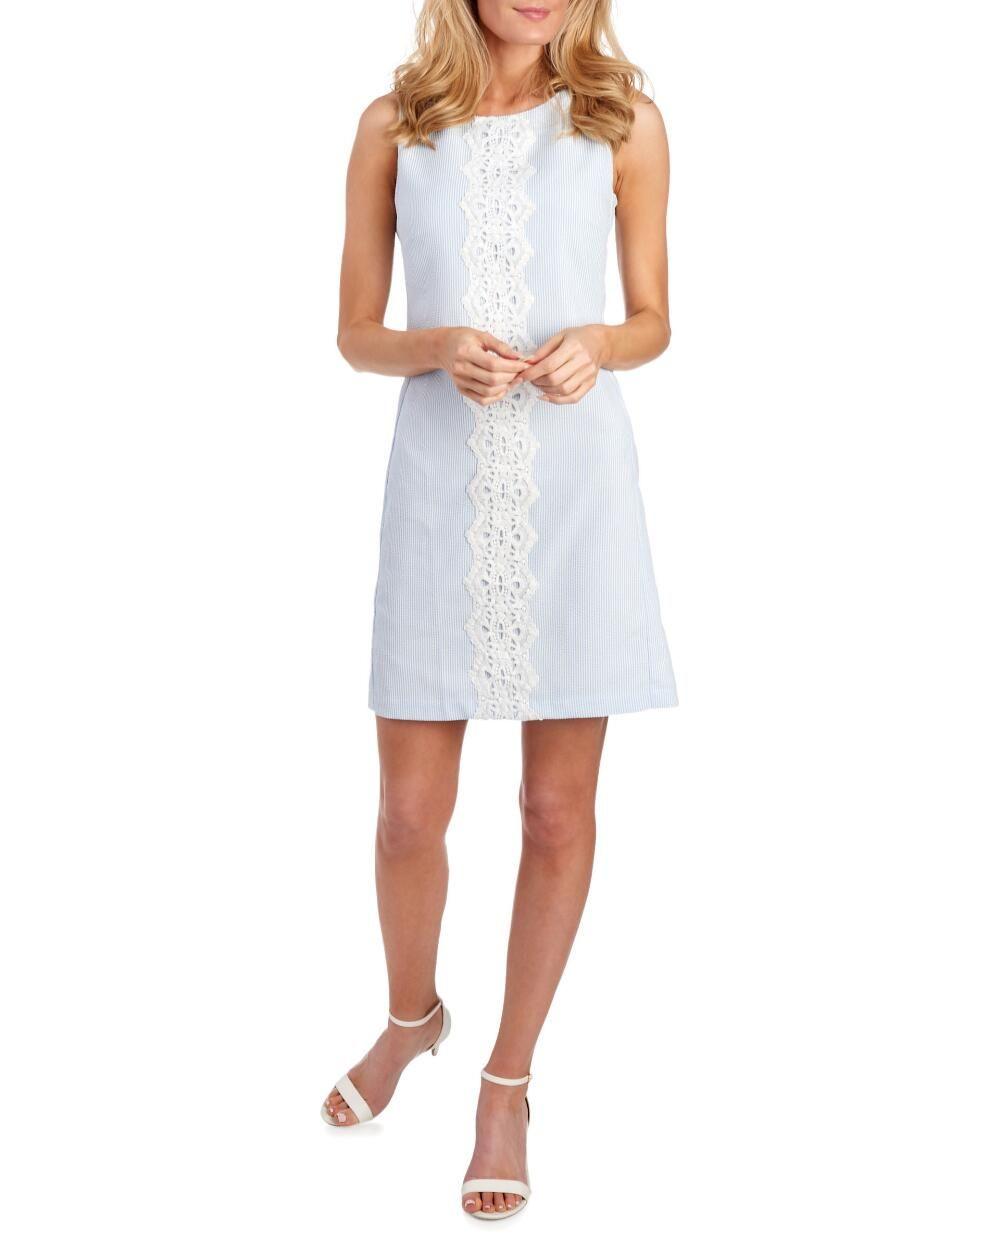 Pappagallo Striped Seersucker Crochet Trim Dress 10 Polyester In 2020 Crochet Trim Dress Dresses Sleeveless Shift Dress [ 1250 x 1000 Pixel ]